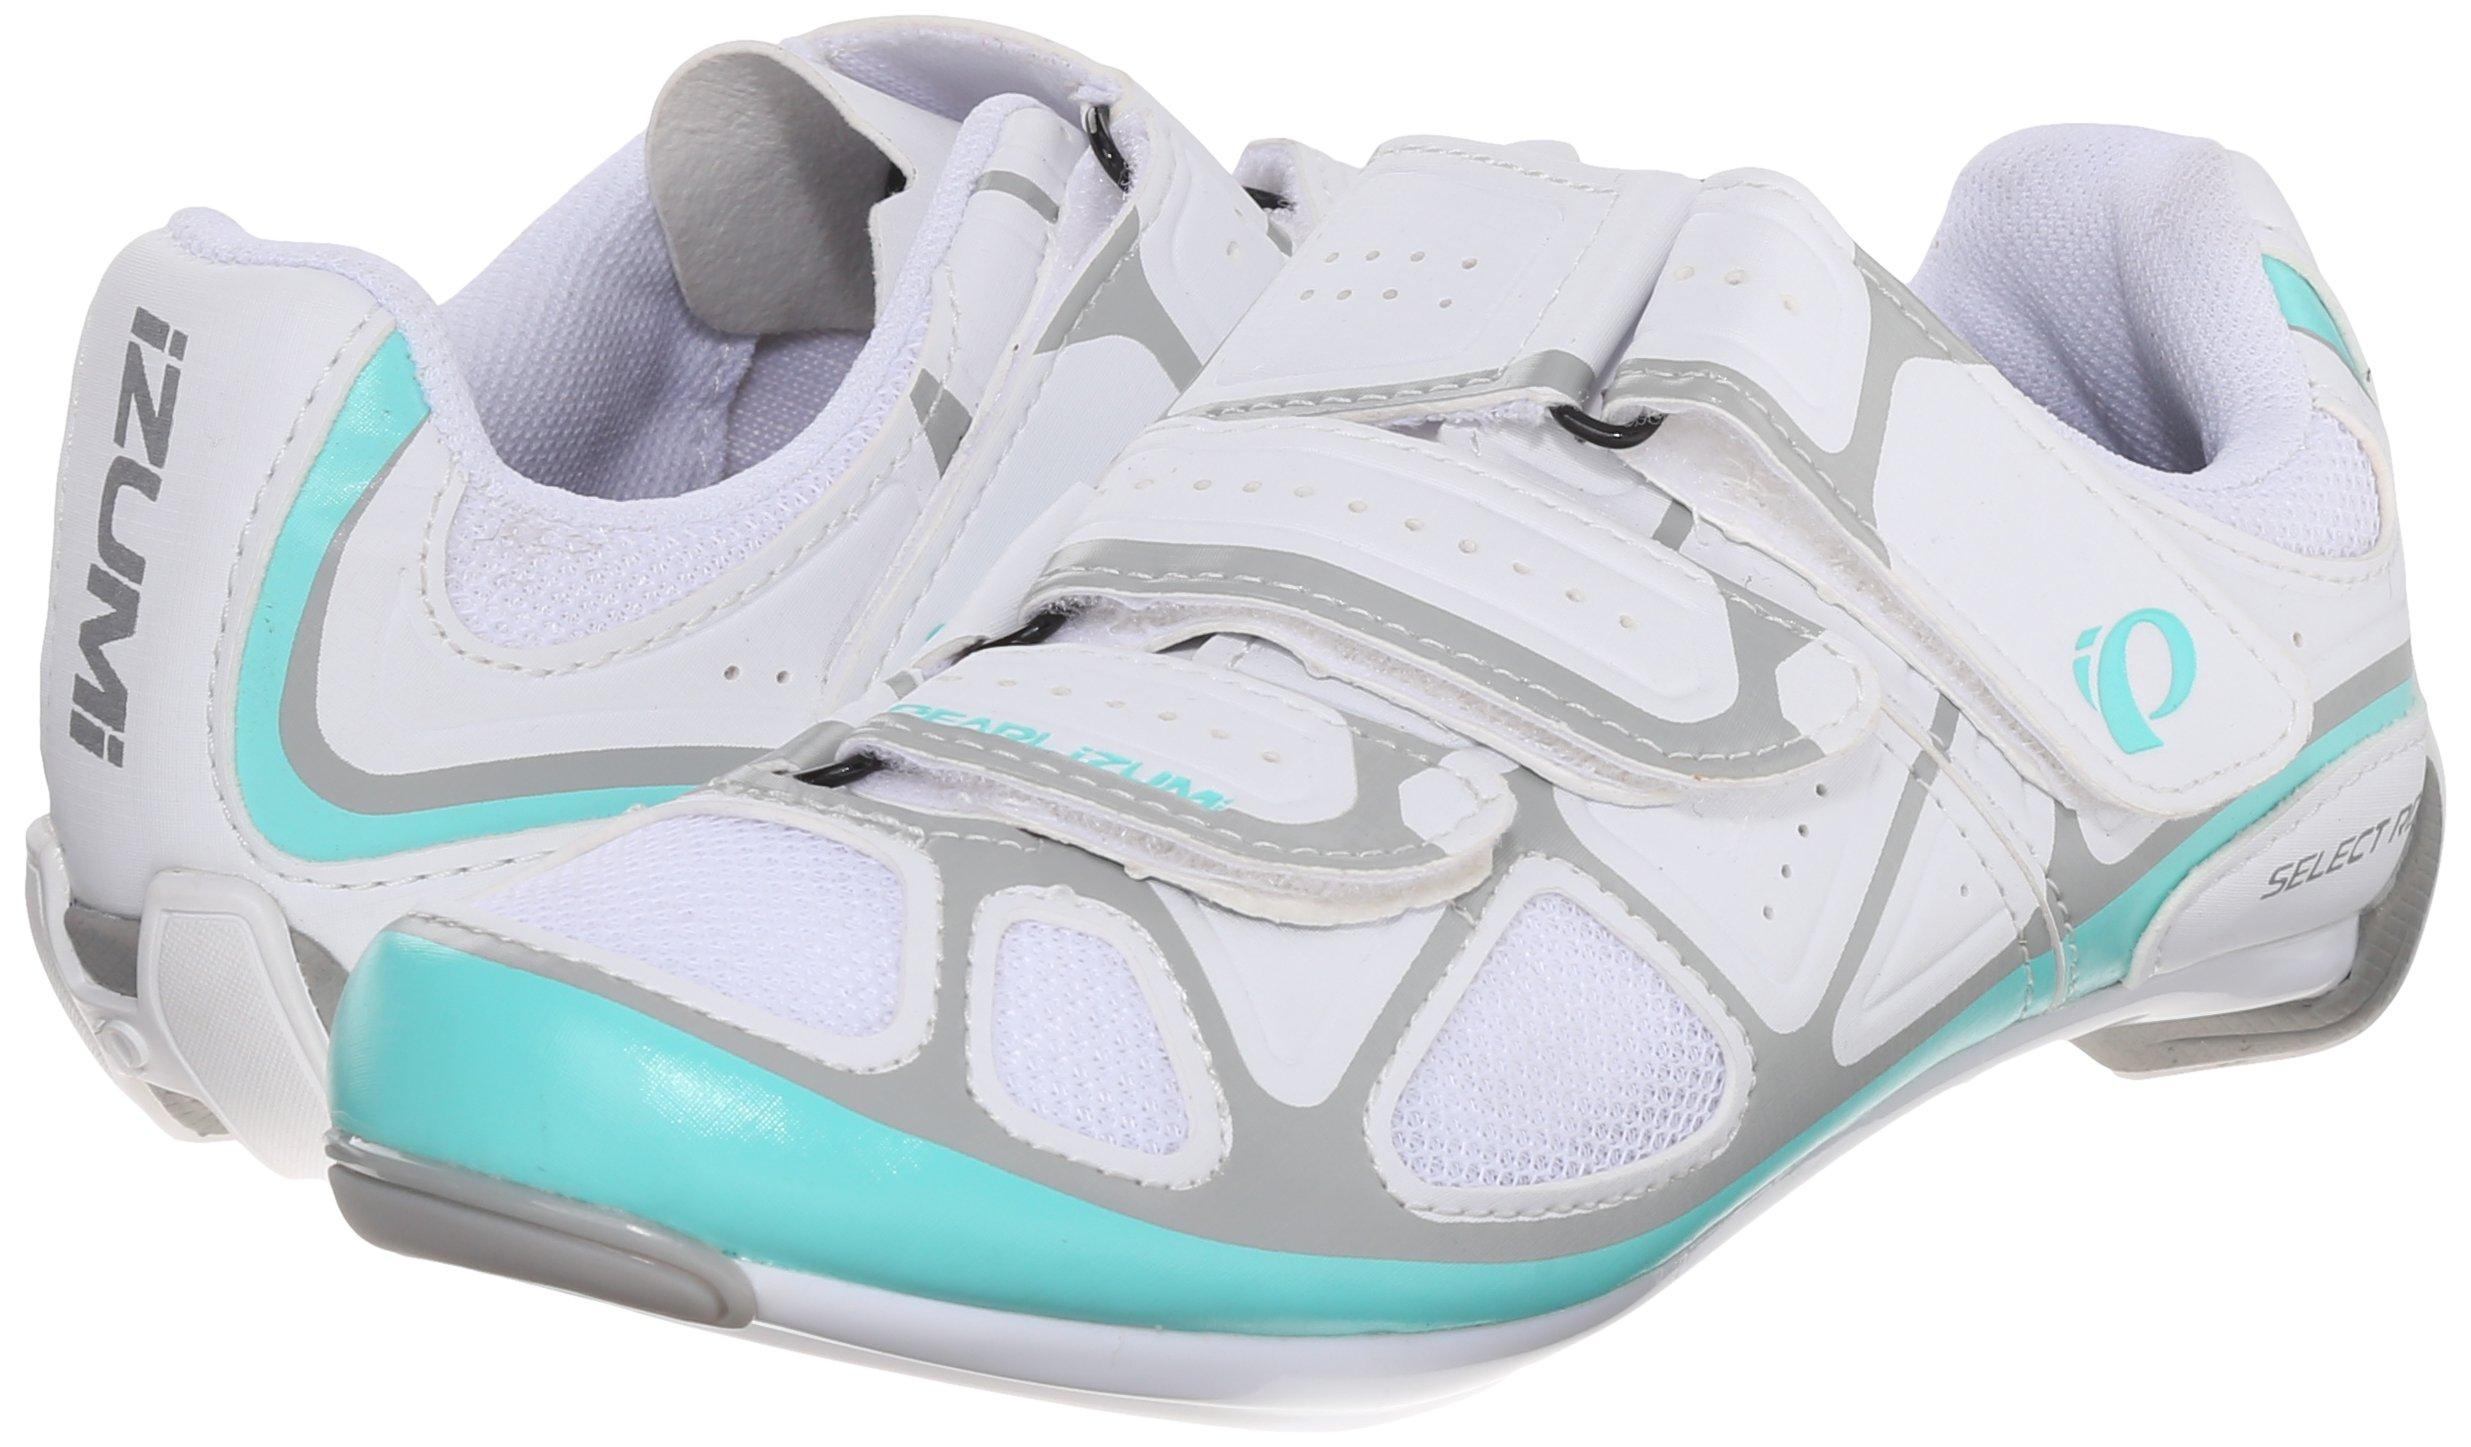 Pearl Izumi Women's W Select RD IV Cycling Shoe, White/Aqua Mint, 40 EU/8.3 B US by Pearl iZUMi (Image #6)